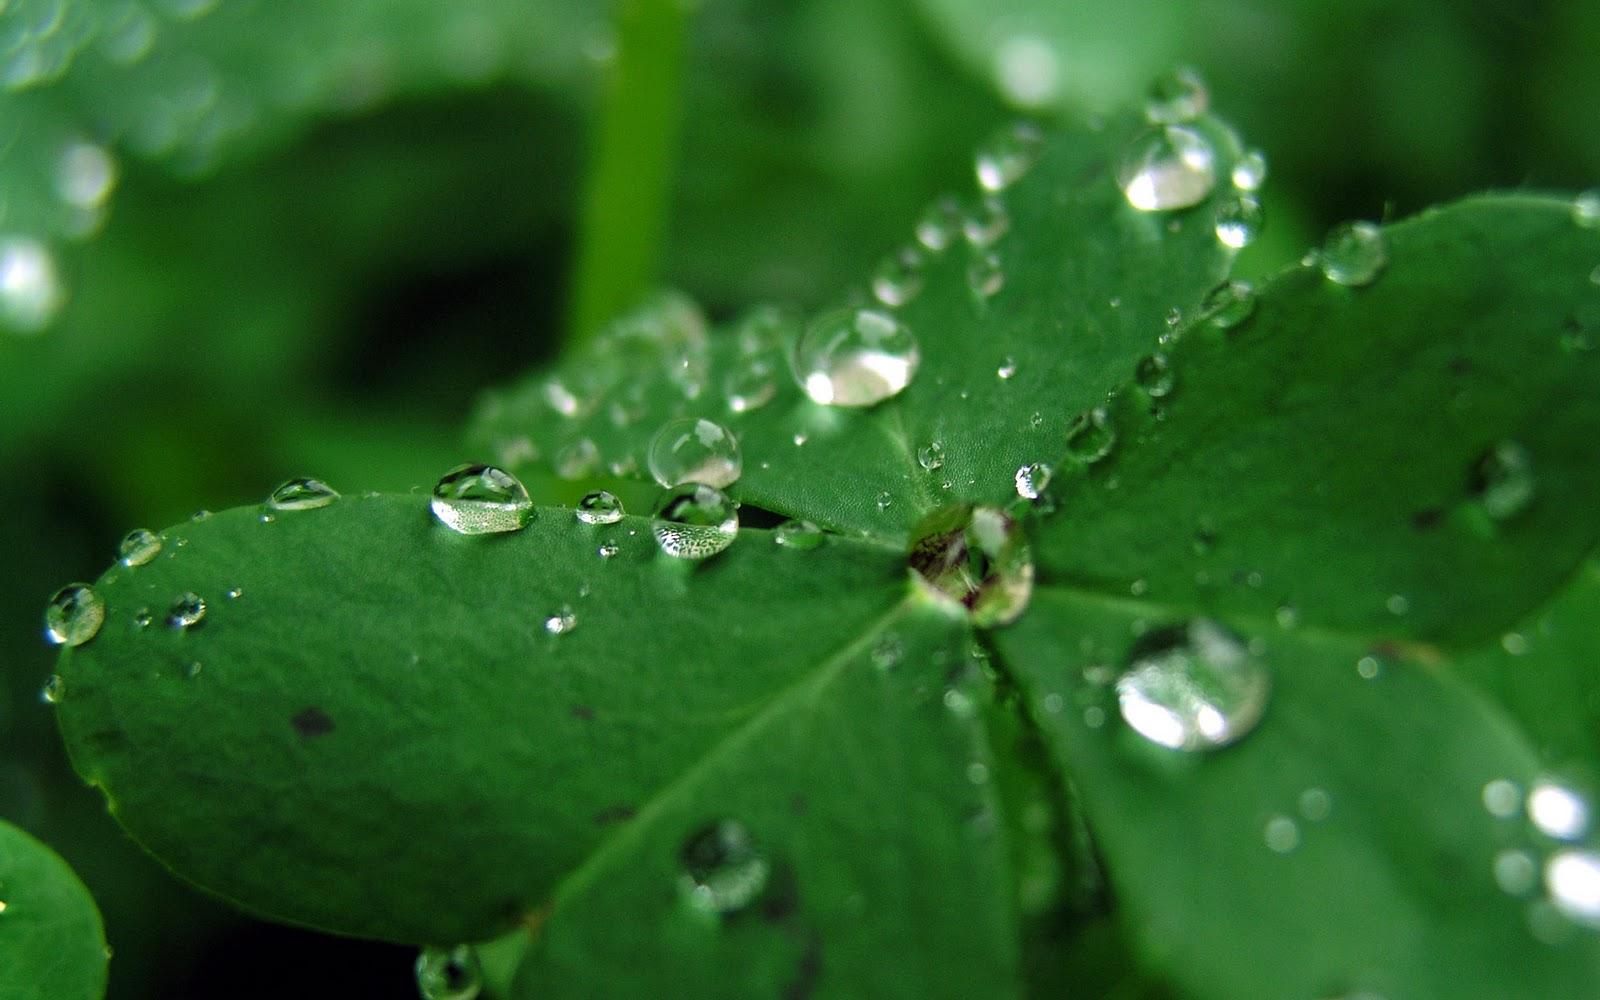 Fresh Rain Drops Green Clover HD Wallpapers Epic Desktop Backgrounds 1600x1000